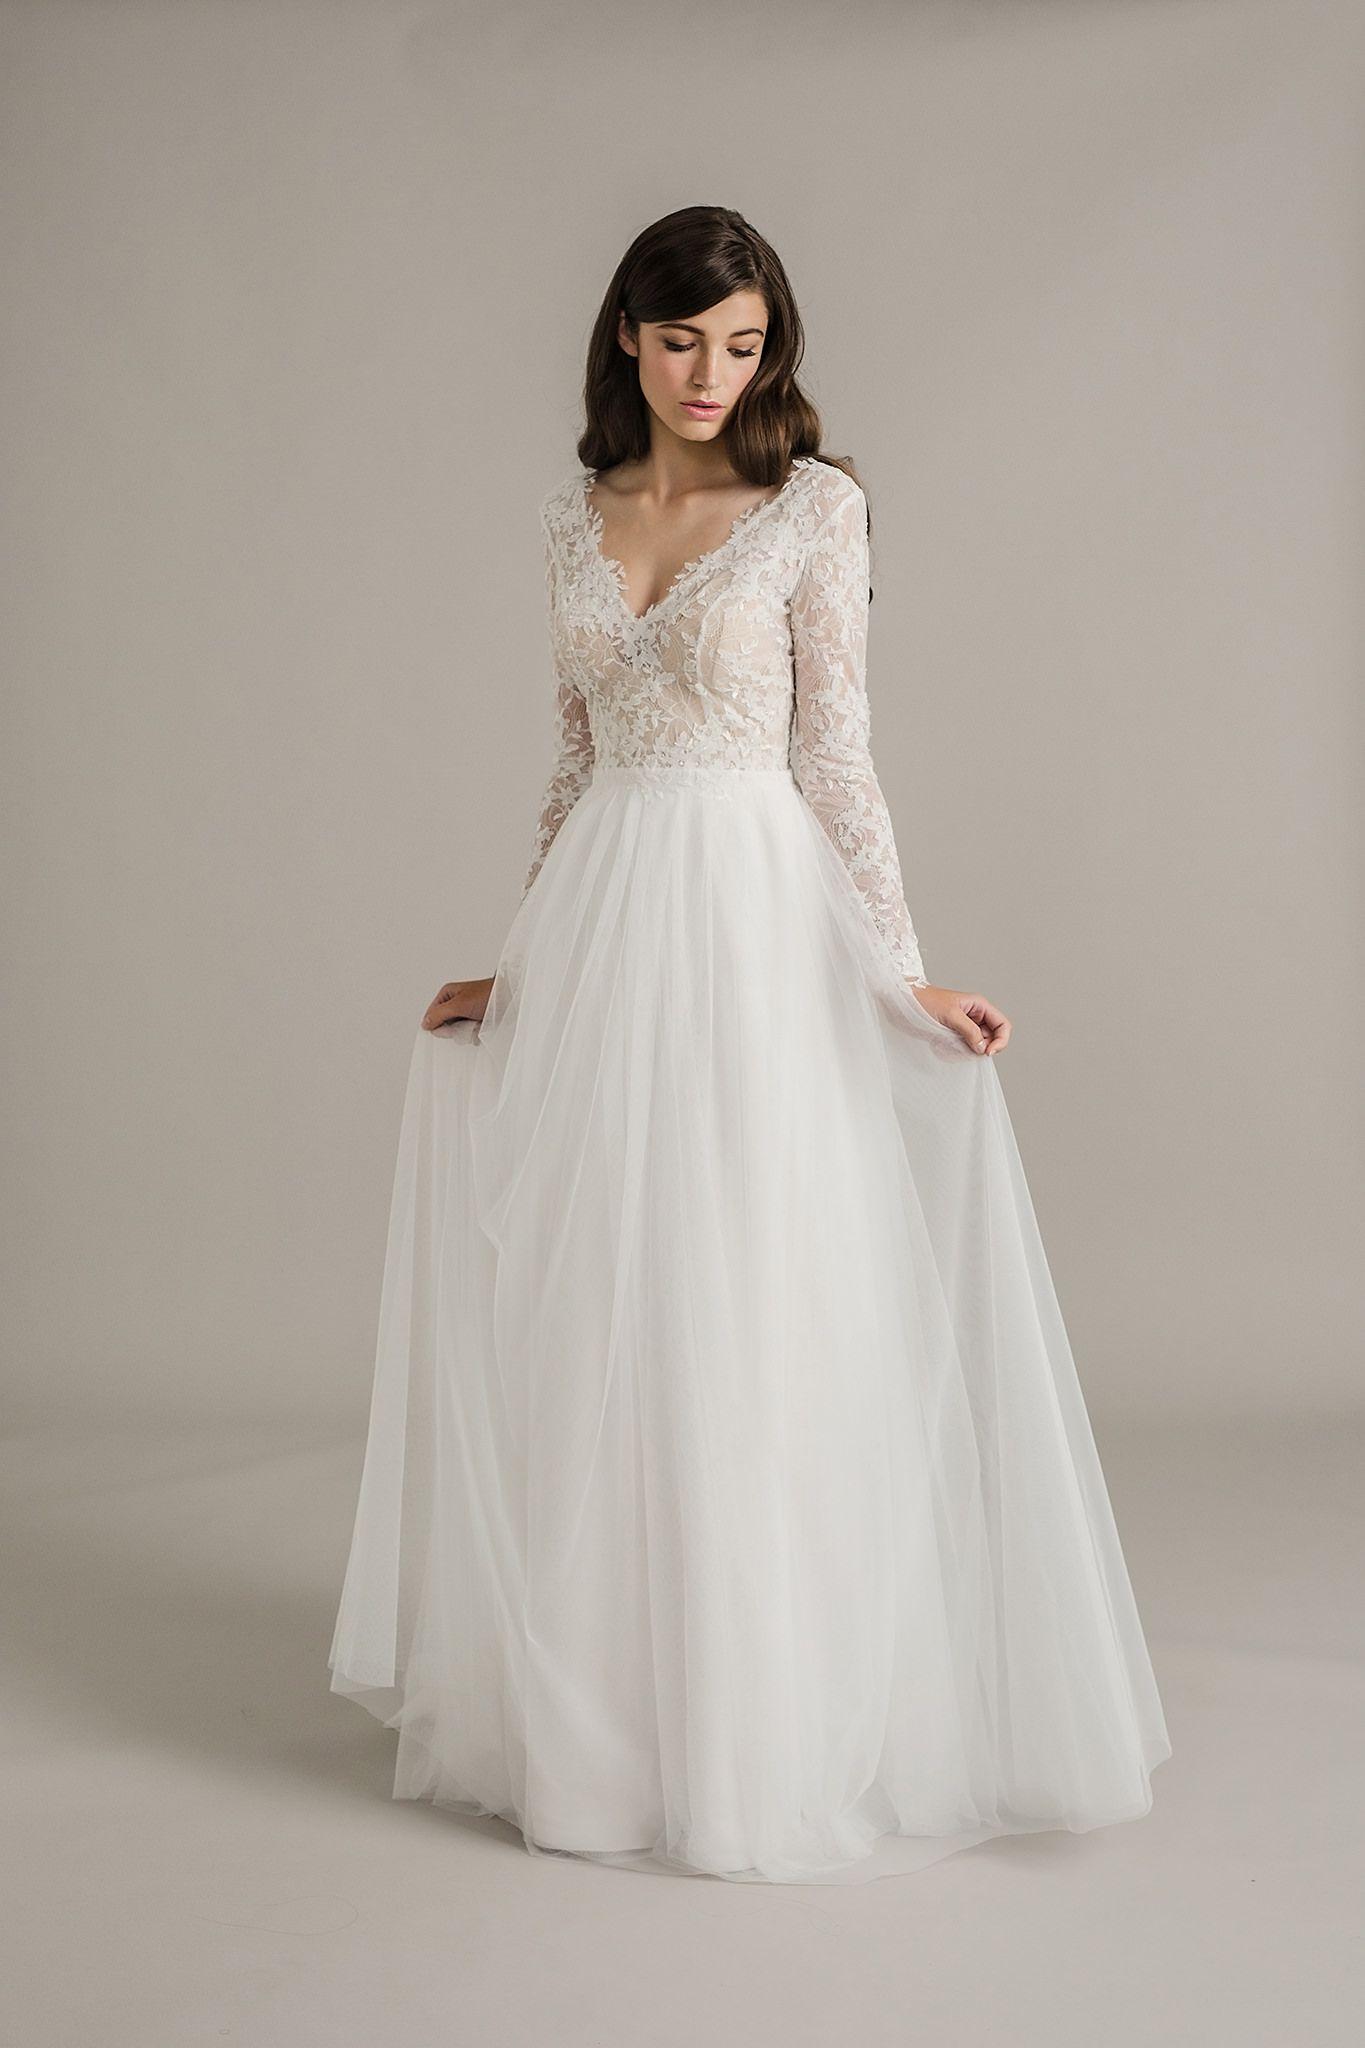 Dusk The Stunning Sally Eagle Wedding Collection Wedding Dress Long Sleeve Wedding Dresses Wedding Dresses Lace [ 2048 x 1365 Pixel ]